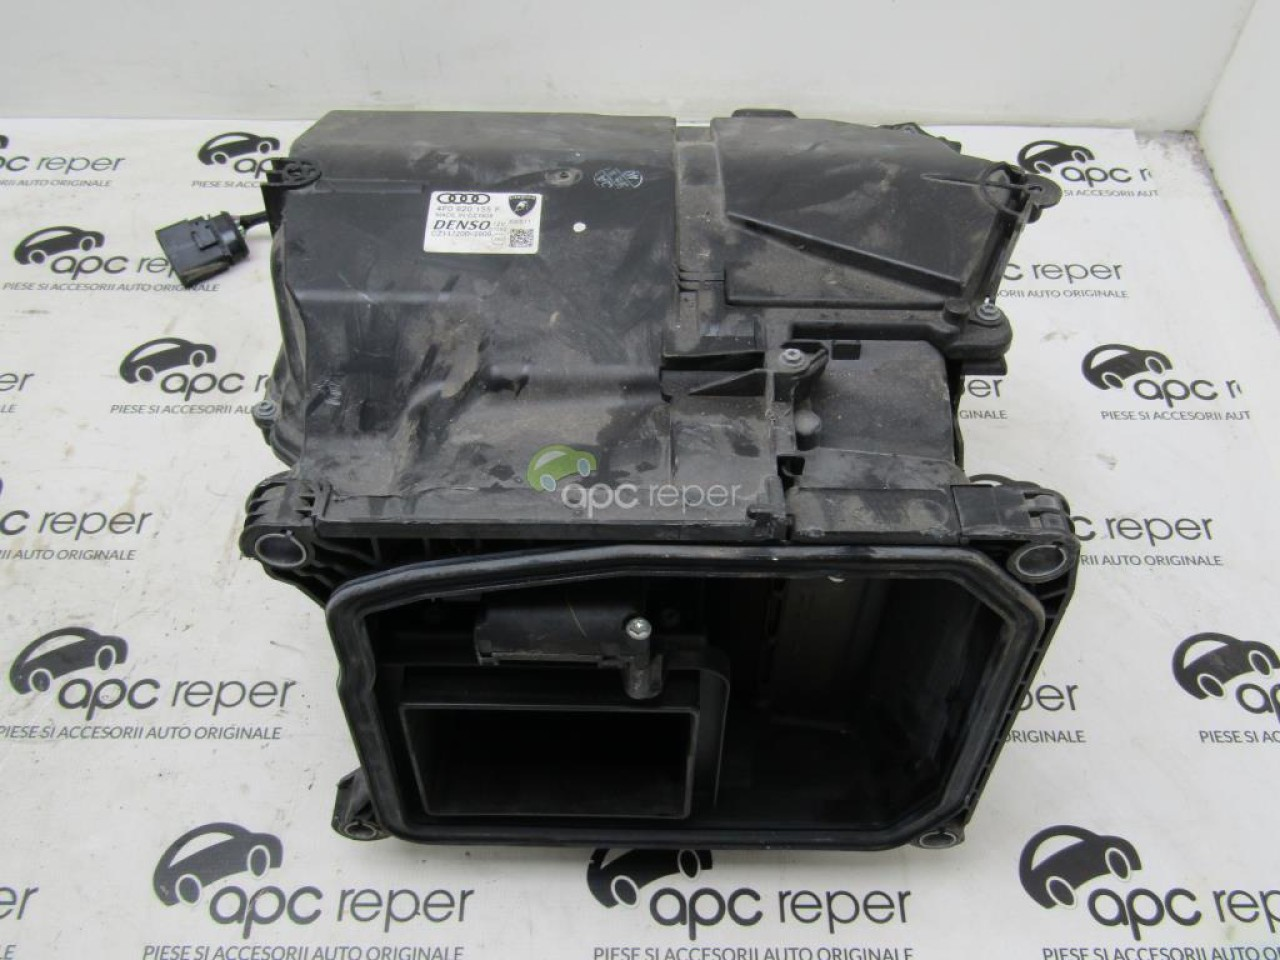 Ventilator aeroterma Audi A6 4F Facelift 2010 - 2,0Tdi cod 4F0820155F